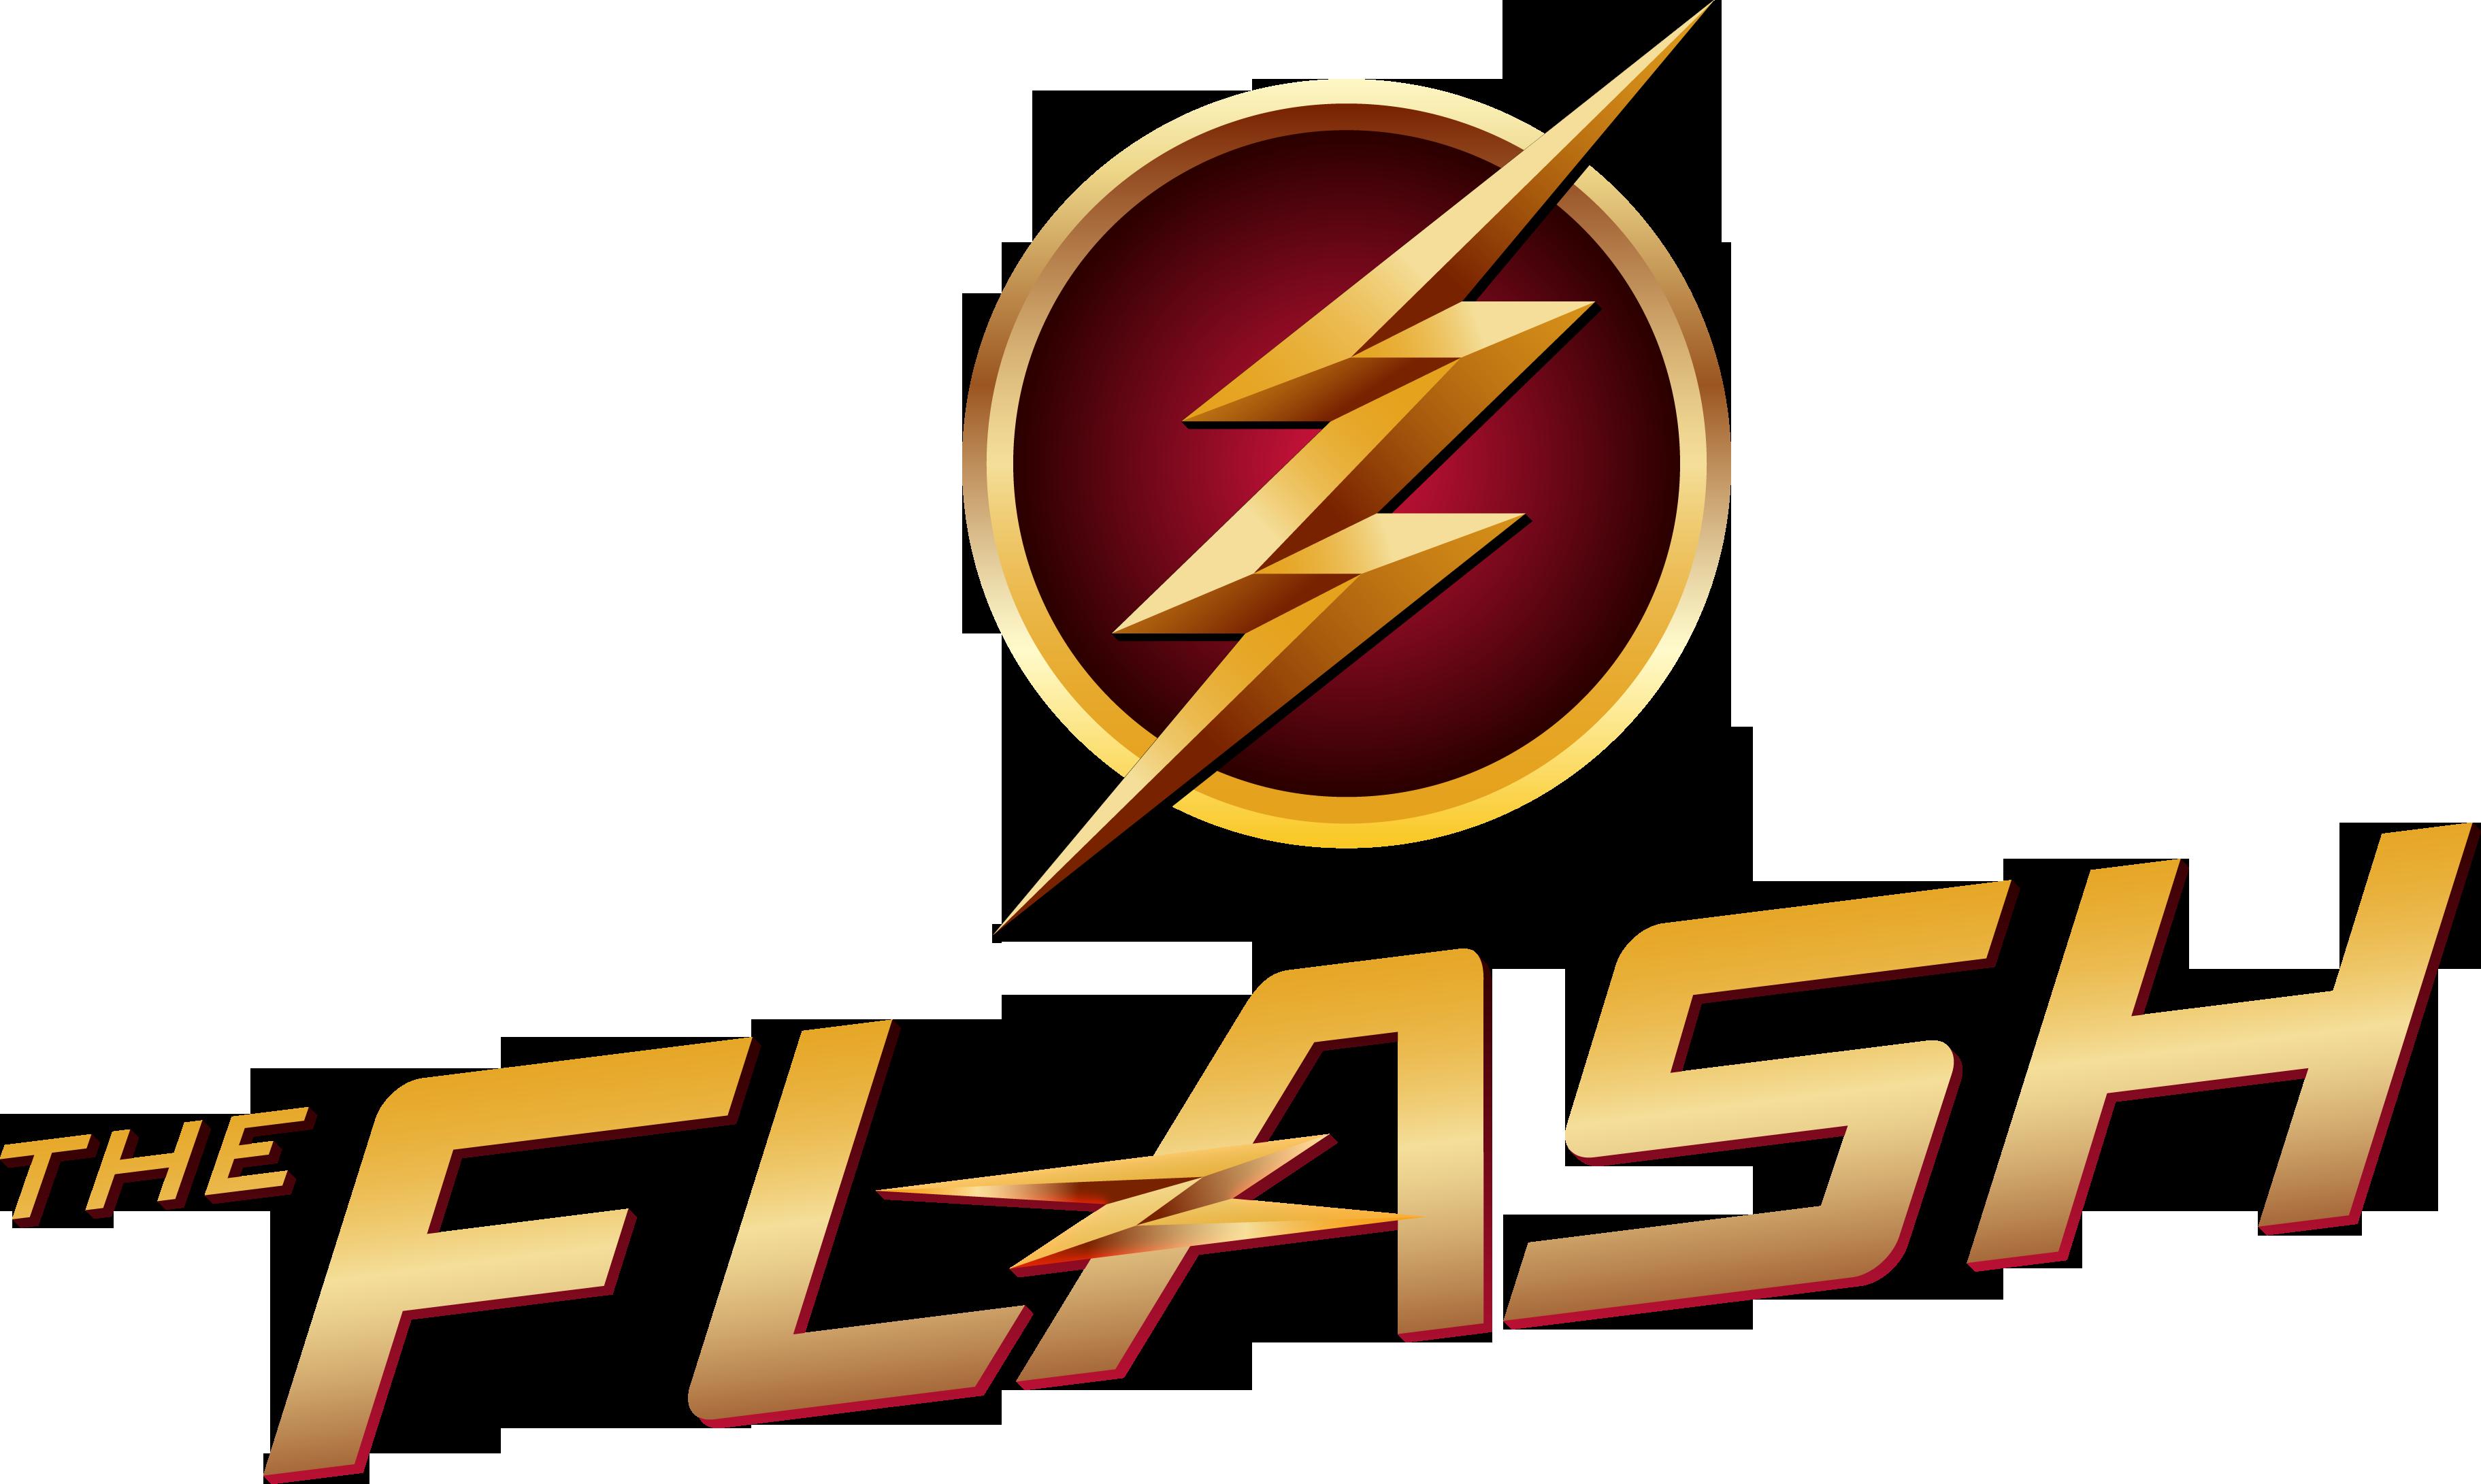 Flash 2014 Images Arte Para Criancas The Flash Herois